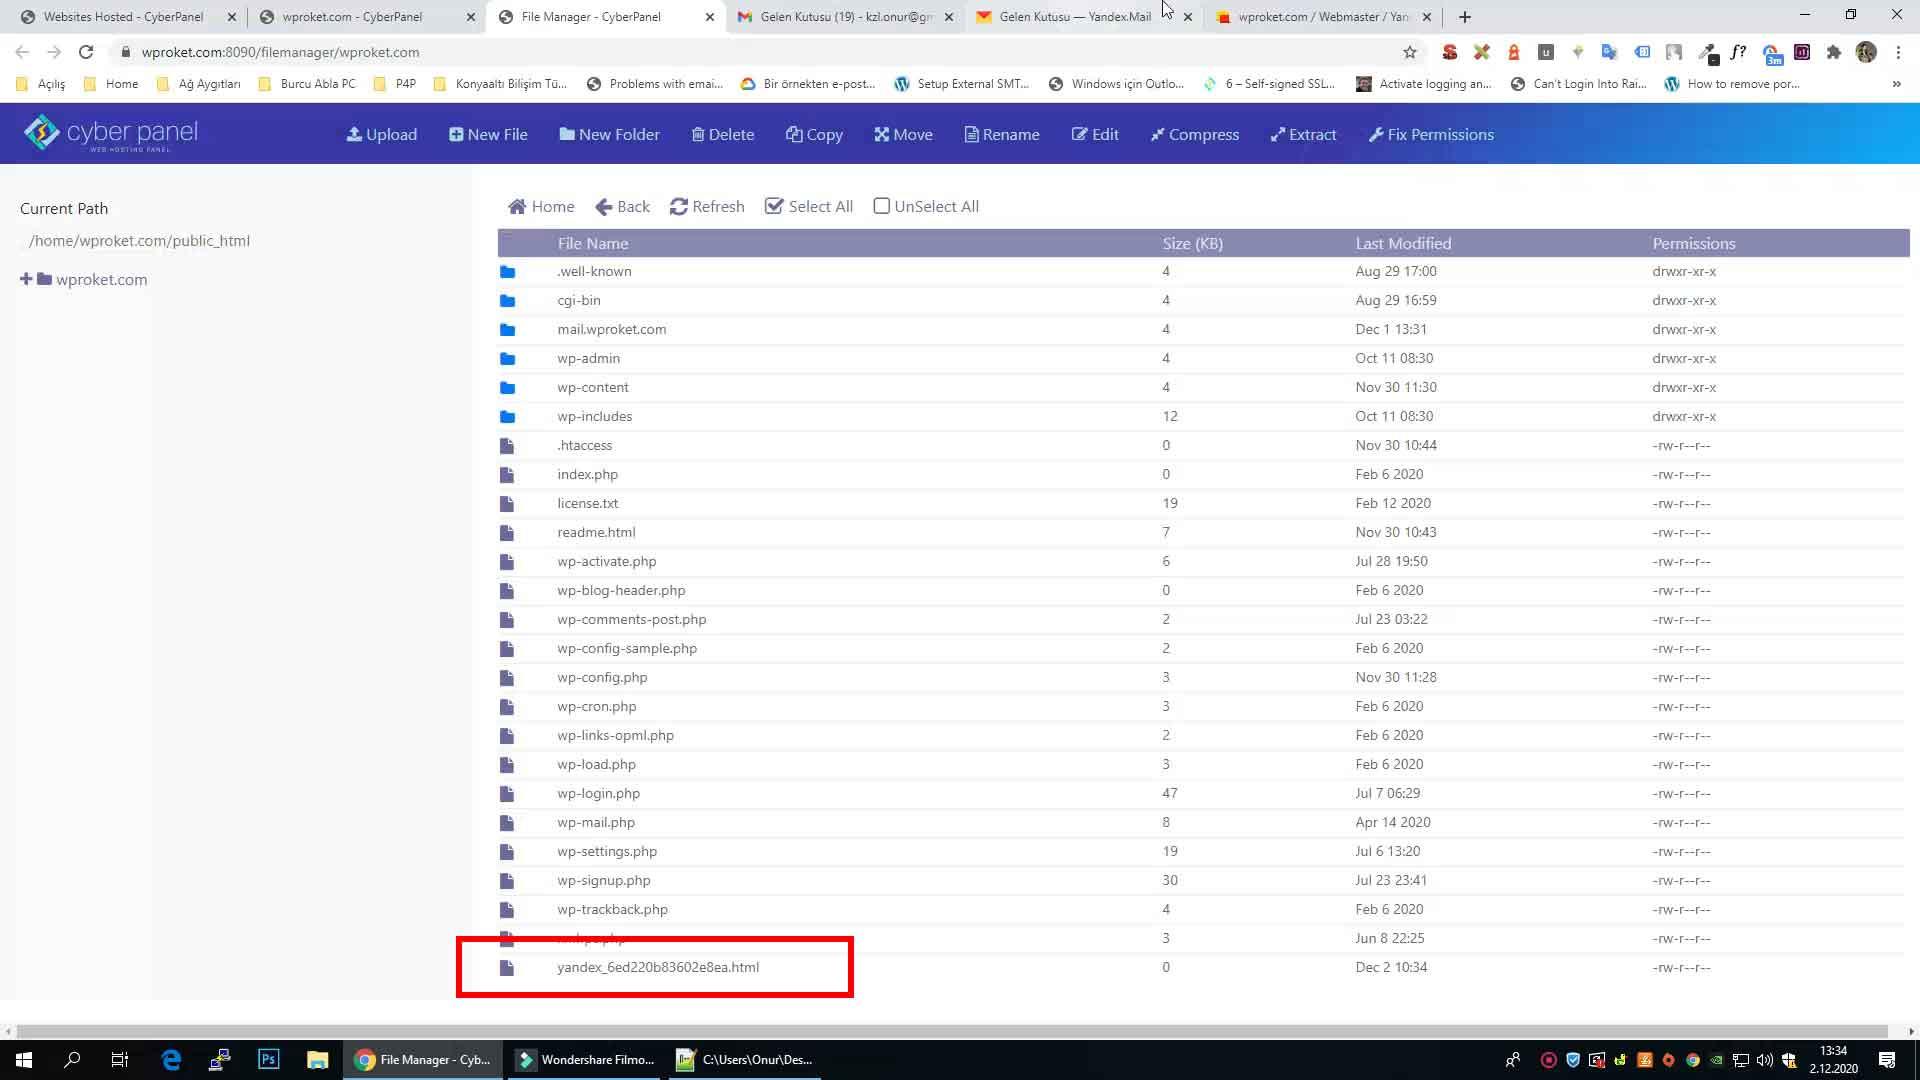 Yandex kurumsal mail ayarları domain doğrulama